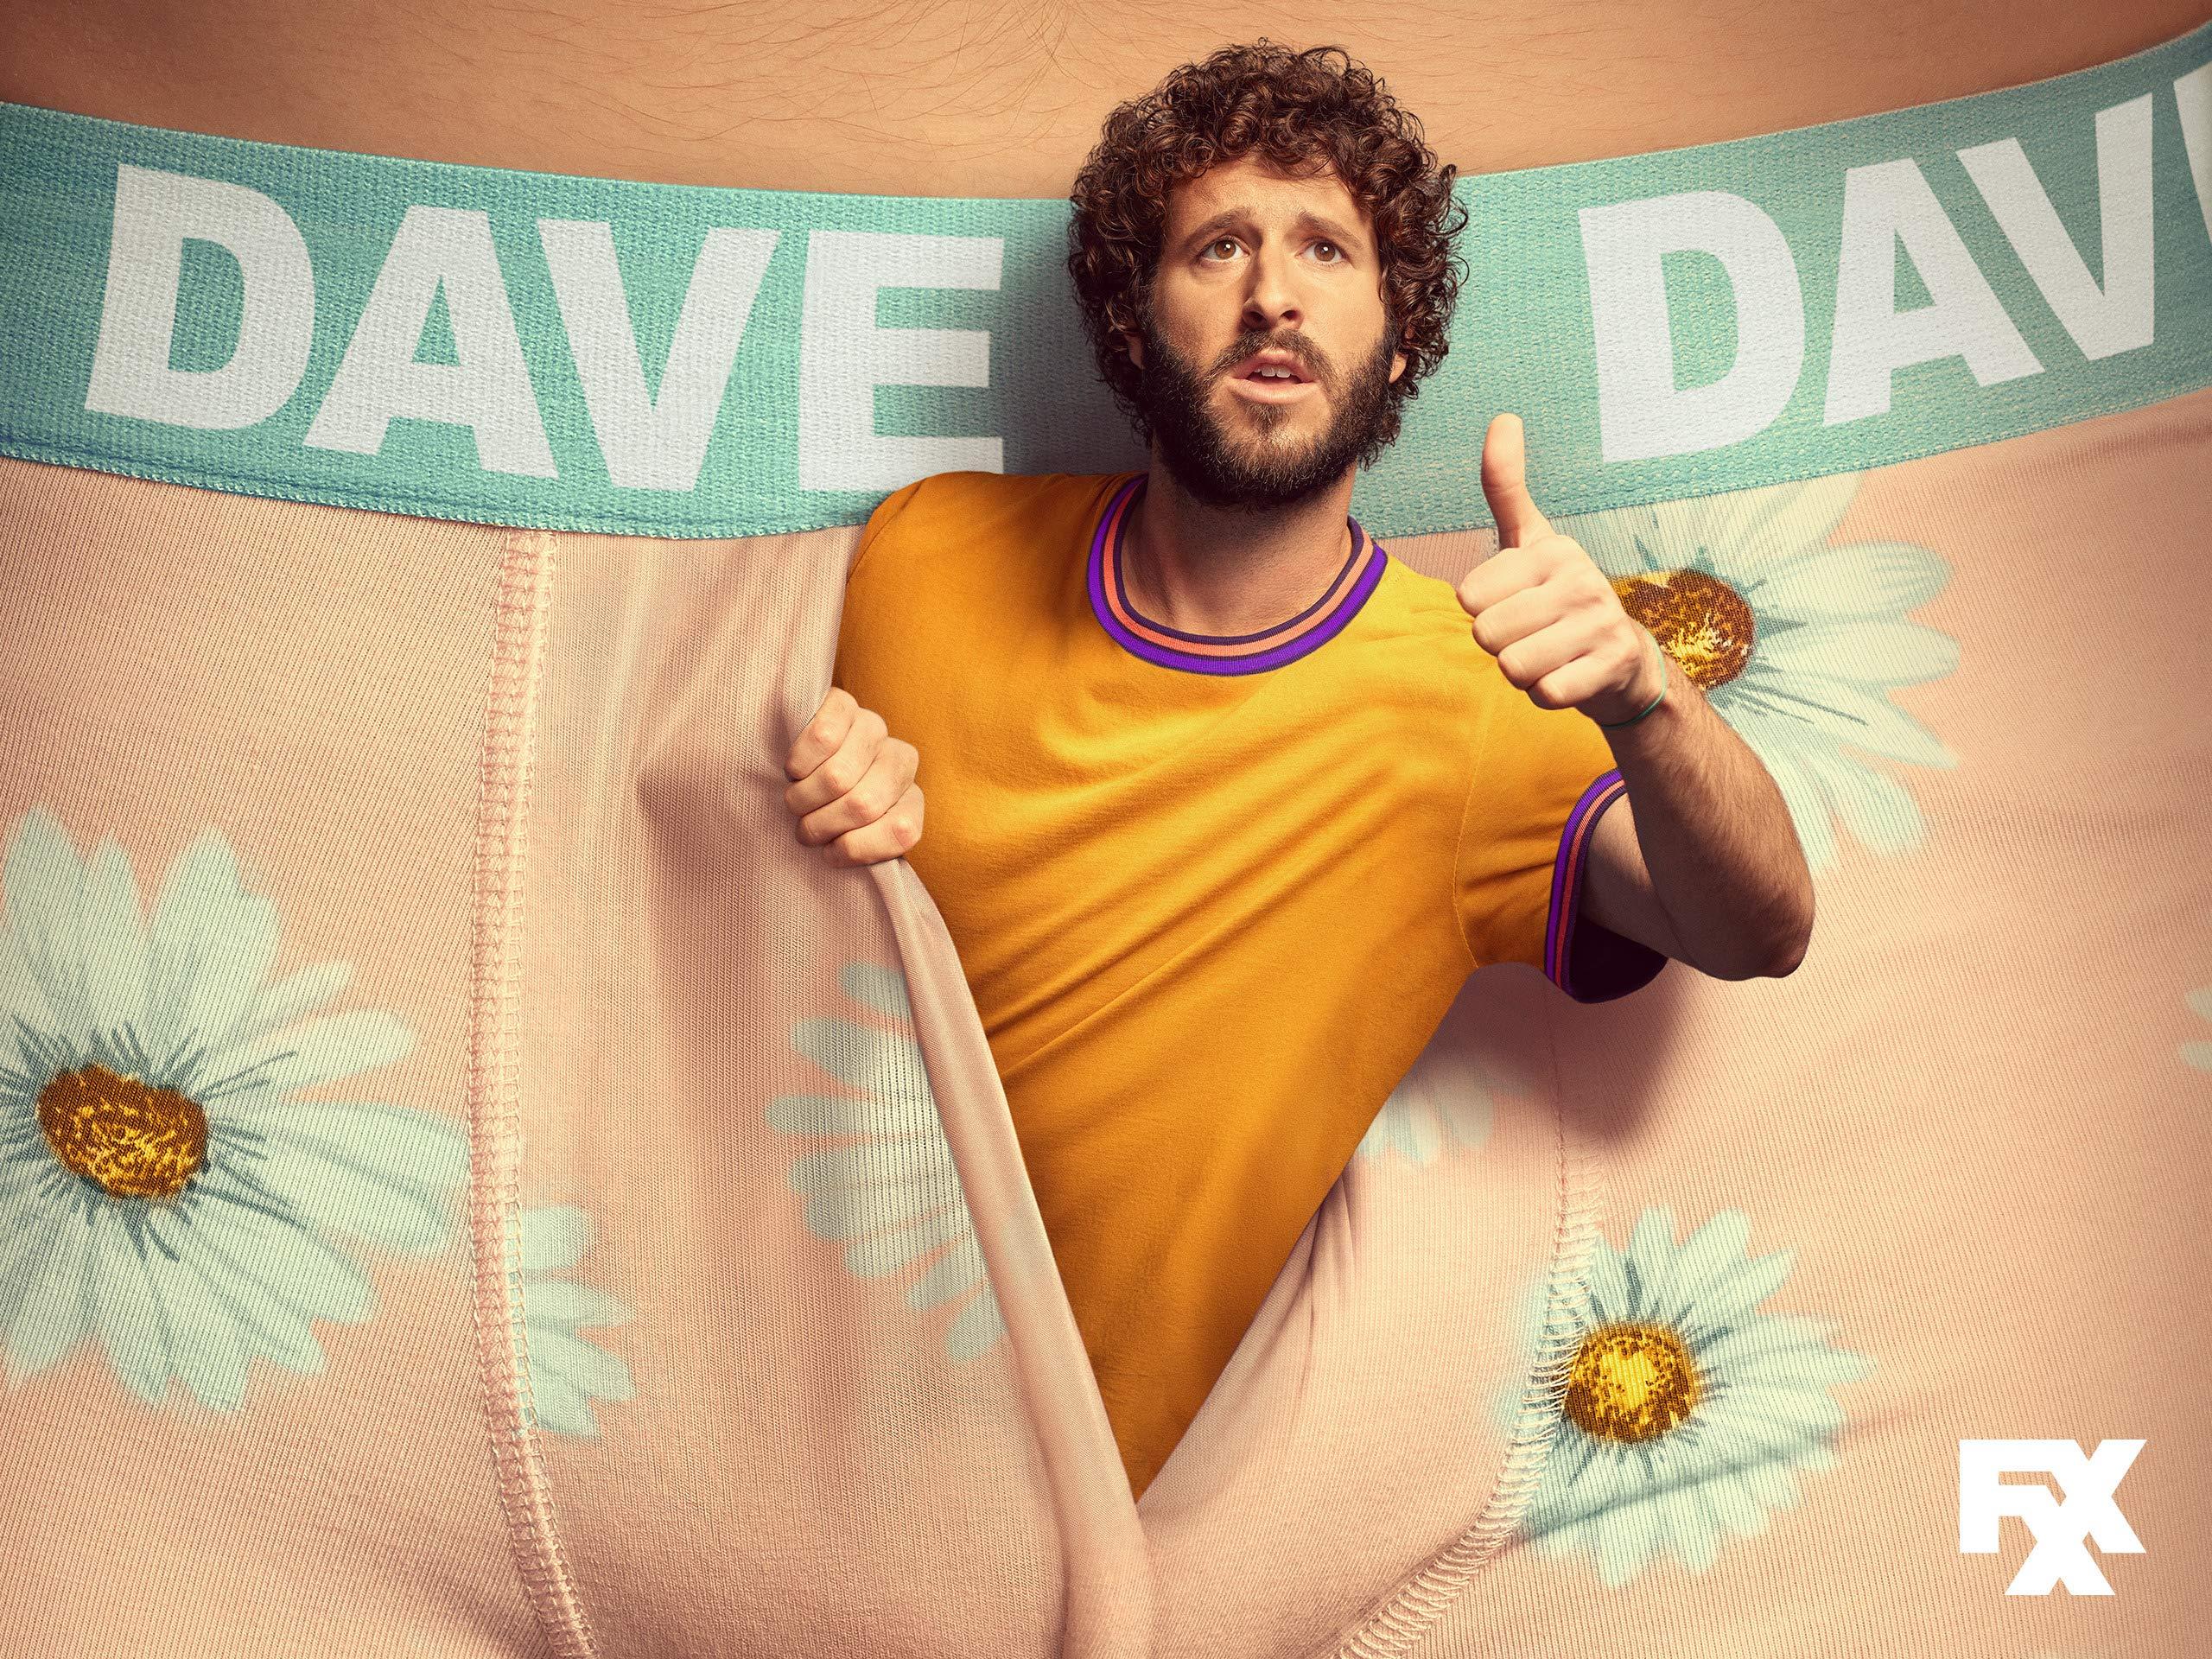 Dave ('Lil Dicky')